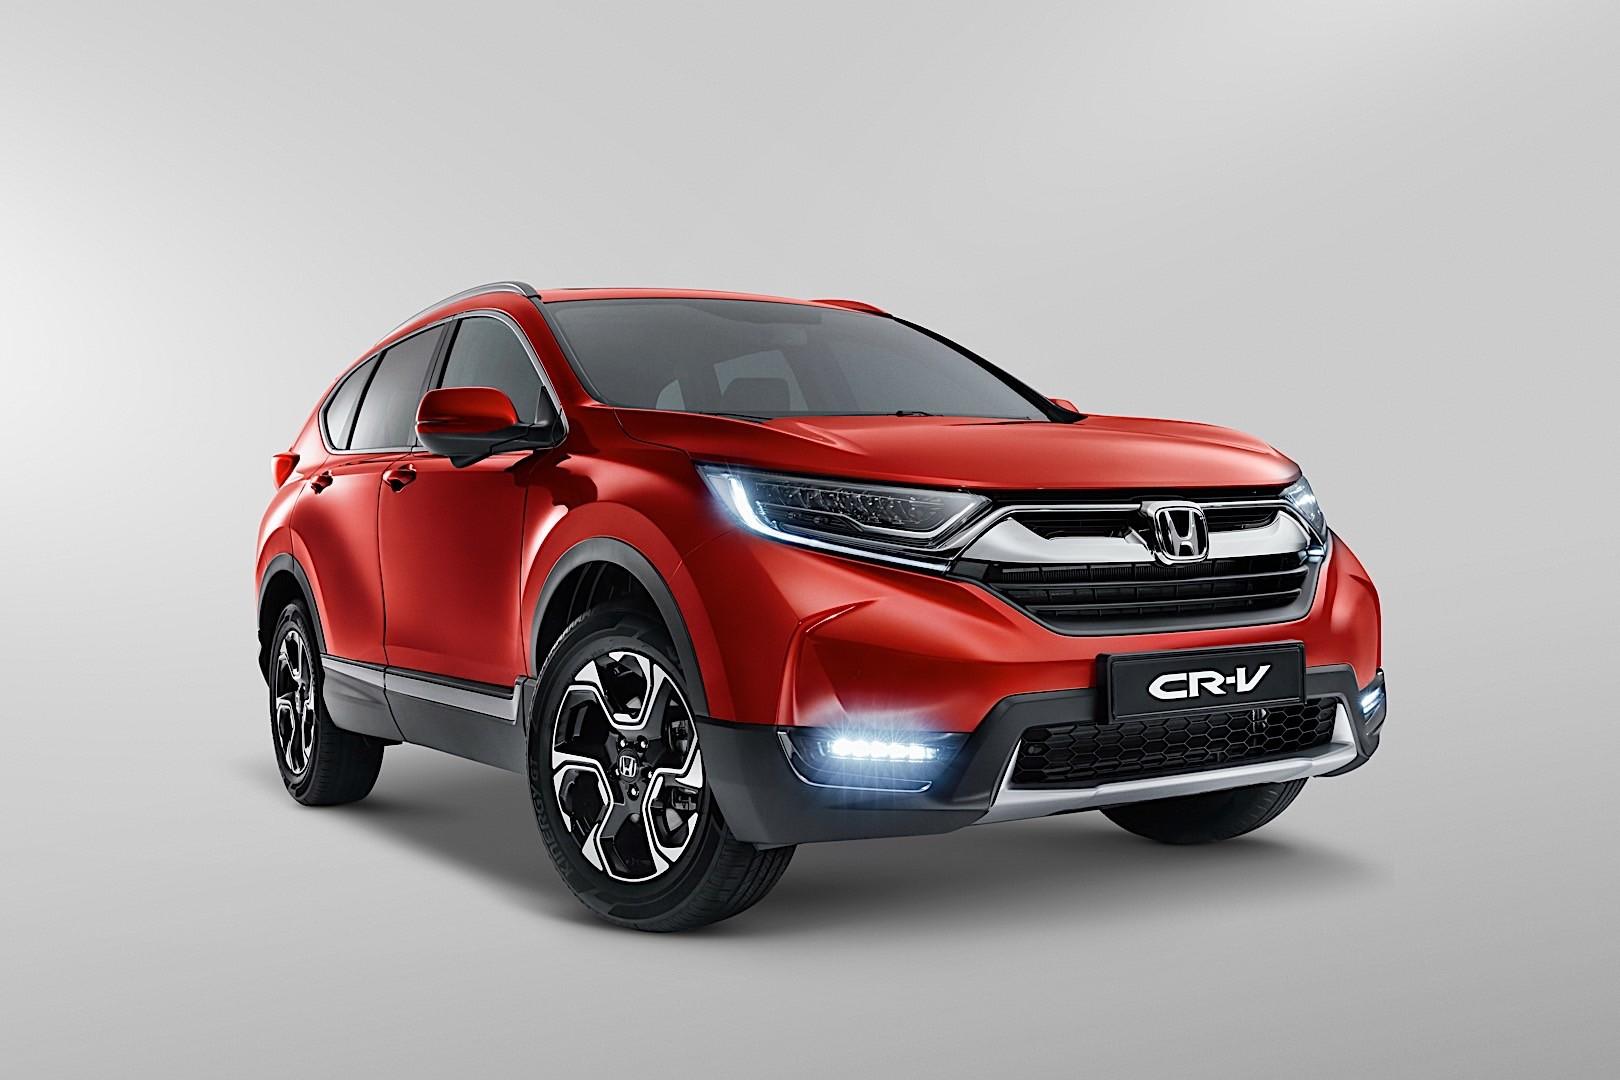 Honda cr v specs 2016 2017 2018 autoevolution for Honda cr v dimensions 2017